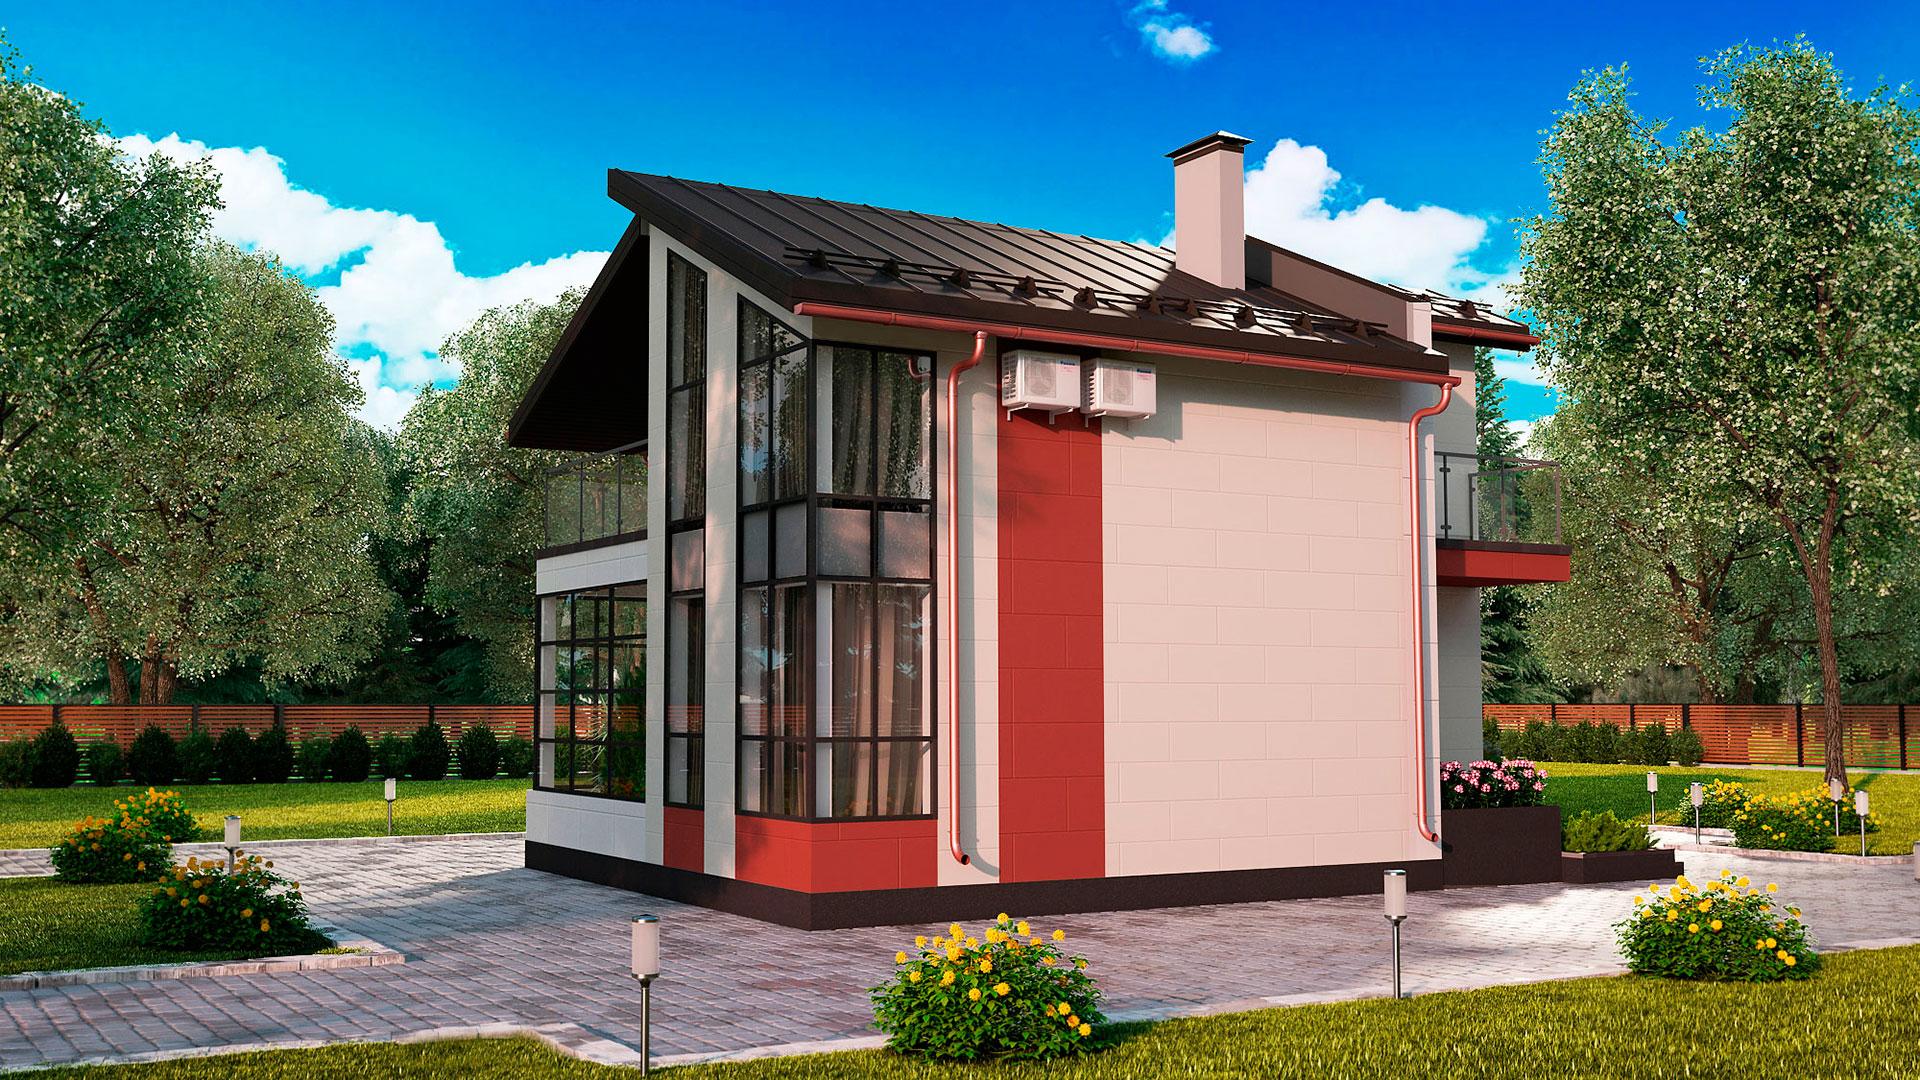 Боковой фасад дома 7 на 10 двухэтажного, проект БЭНПАН МС-112.